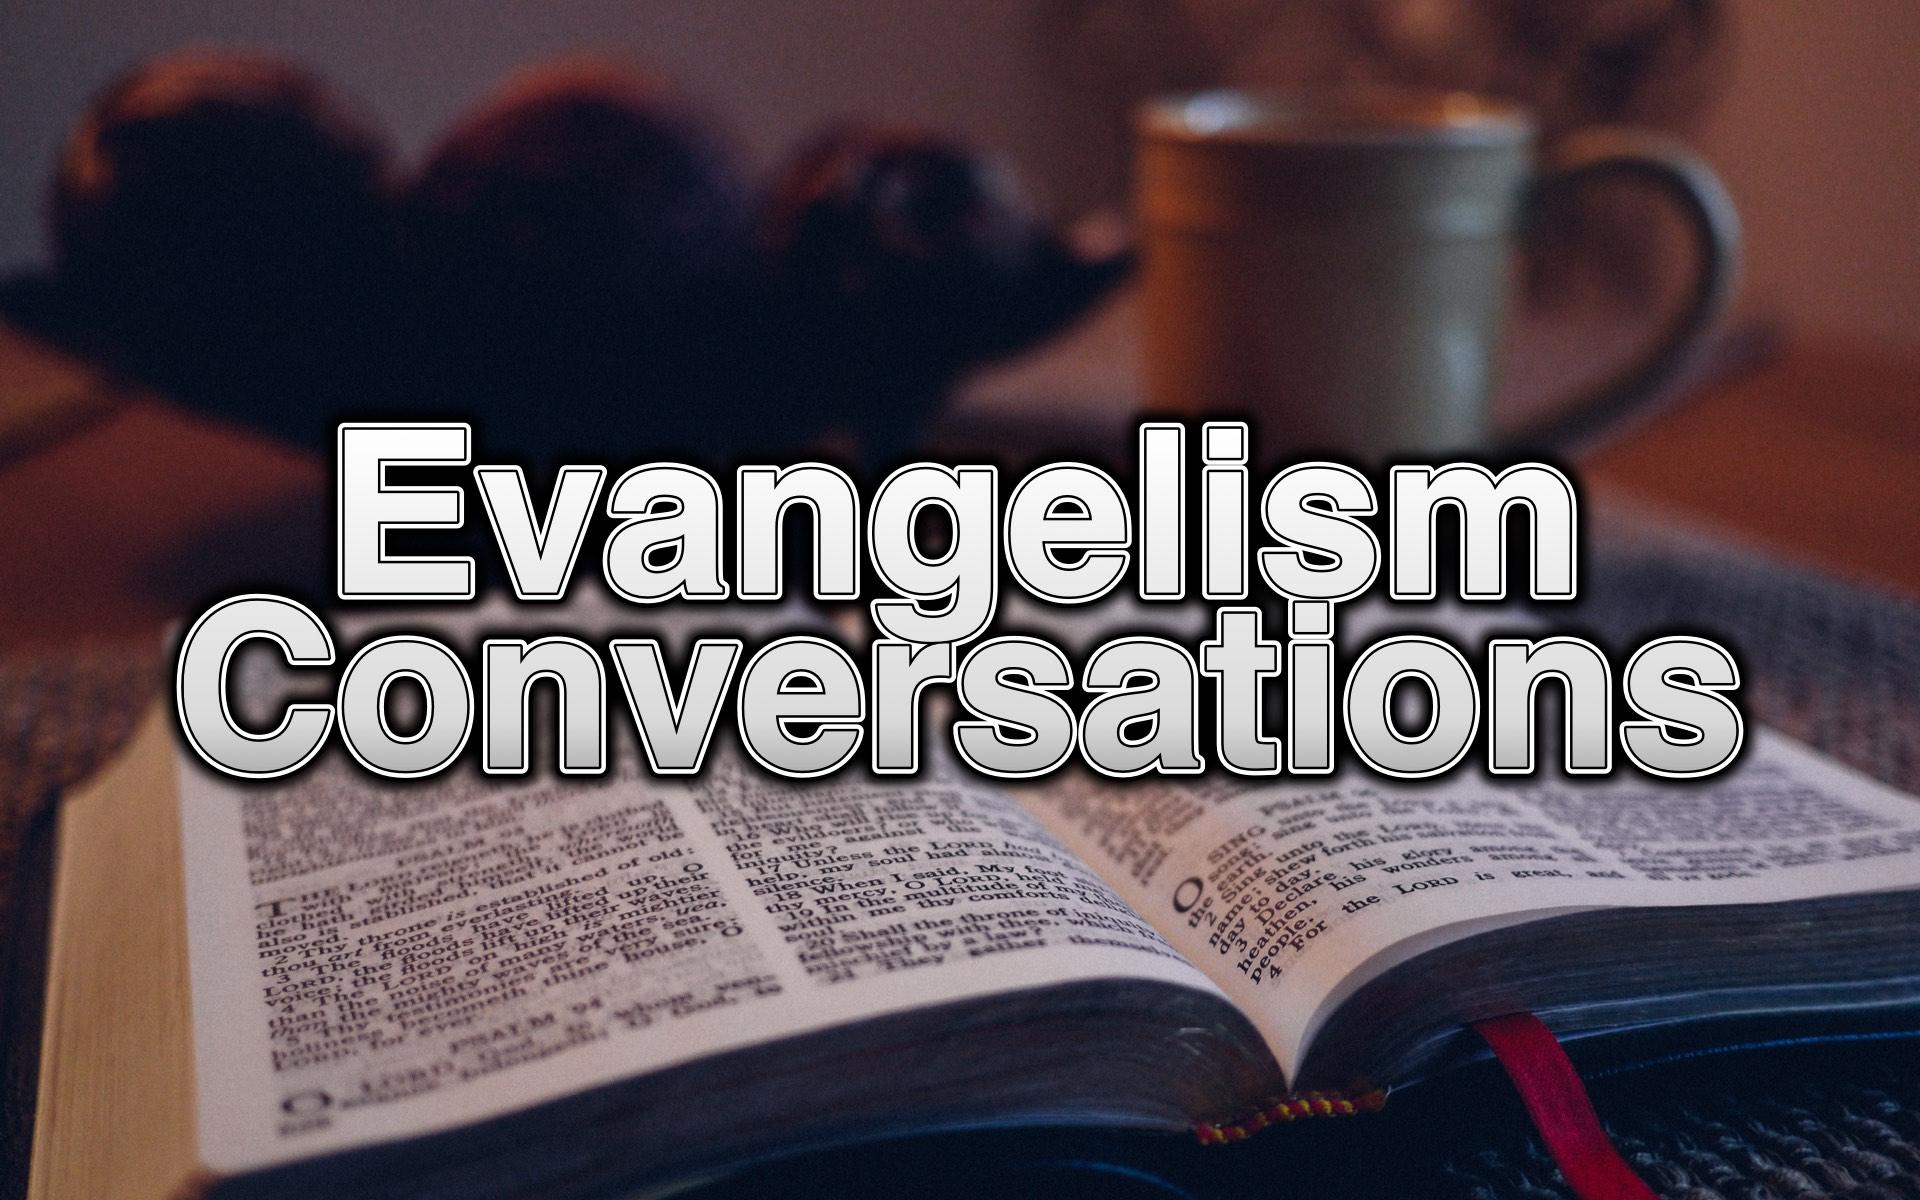 Evangelism Conversations